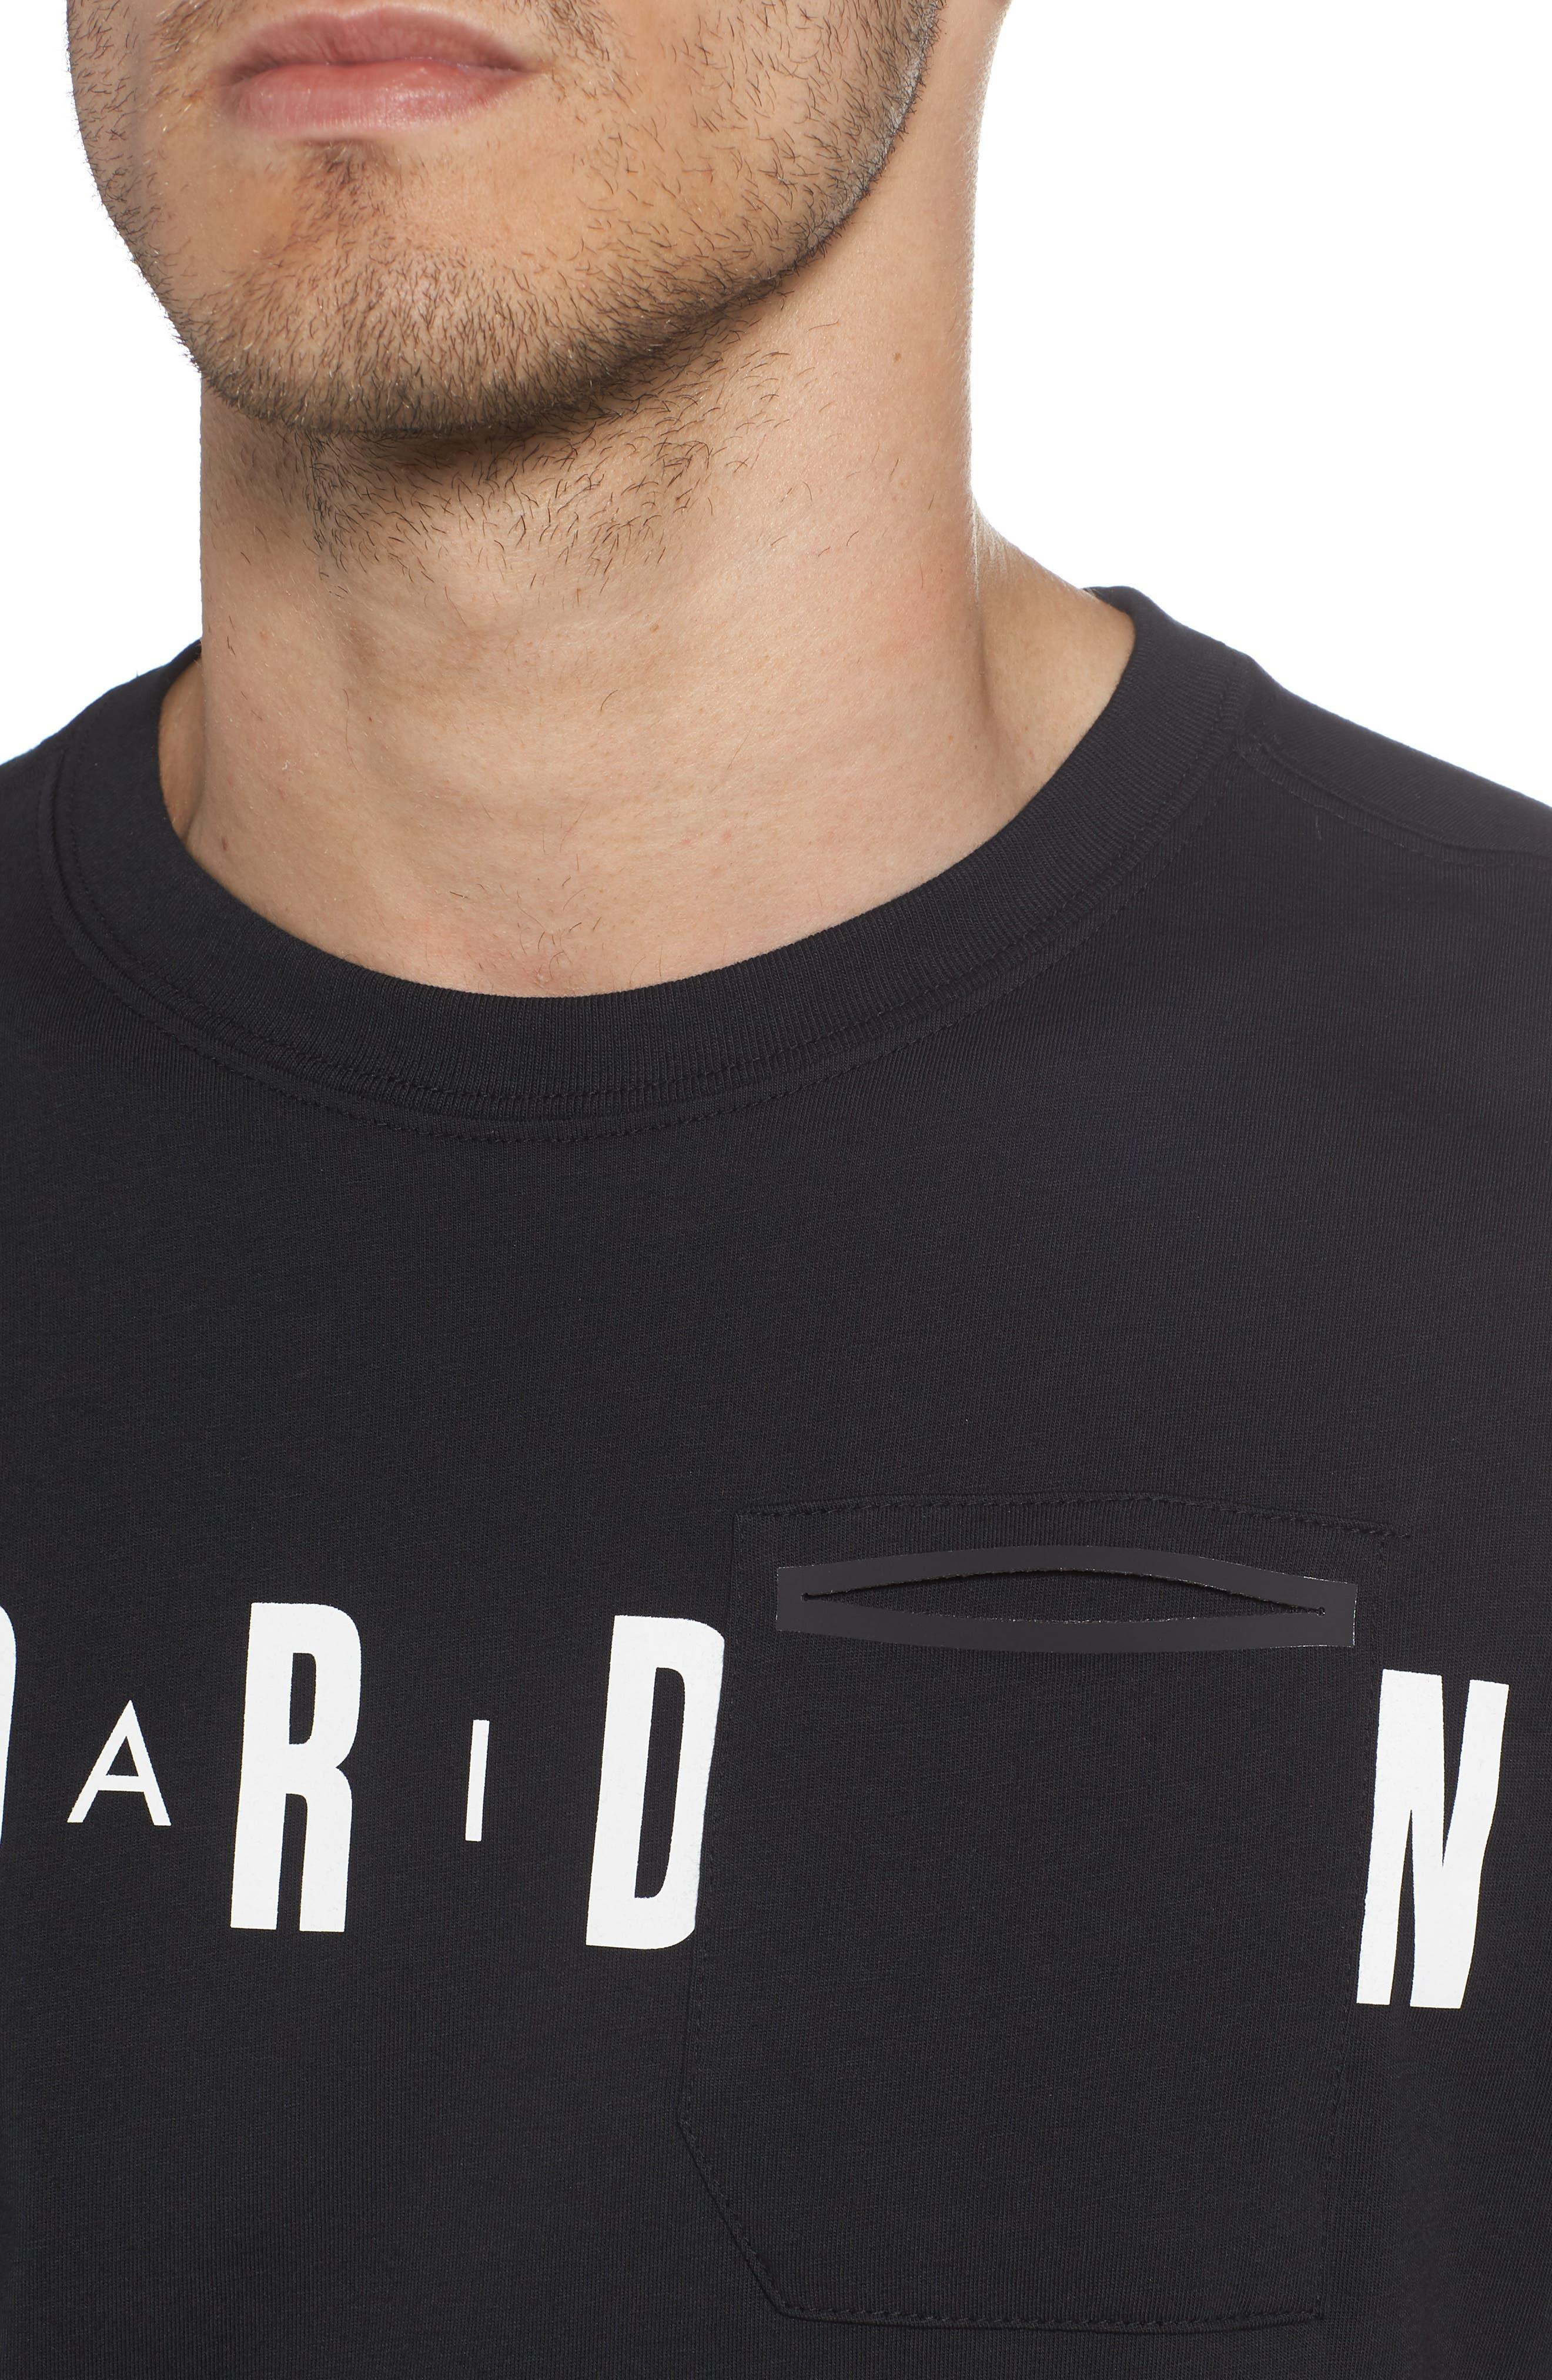 Jordan Sportswear Graphic Shirt,                             Alternate thumbnail 4, color,                             Black/ White